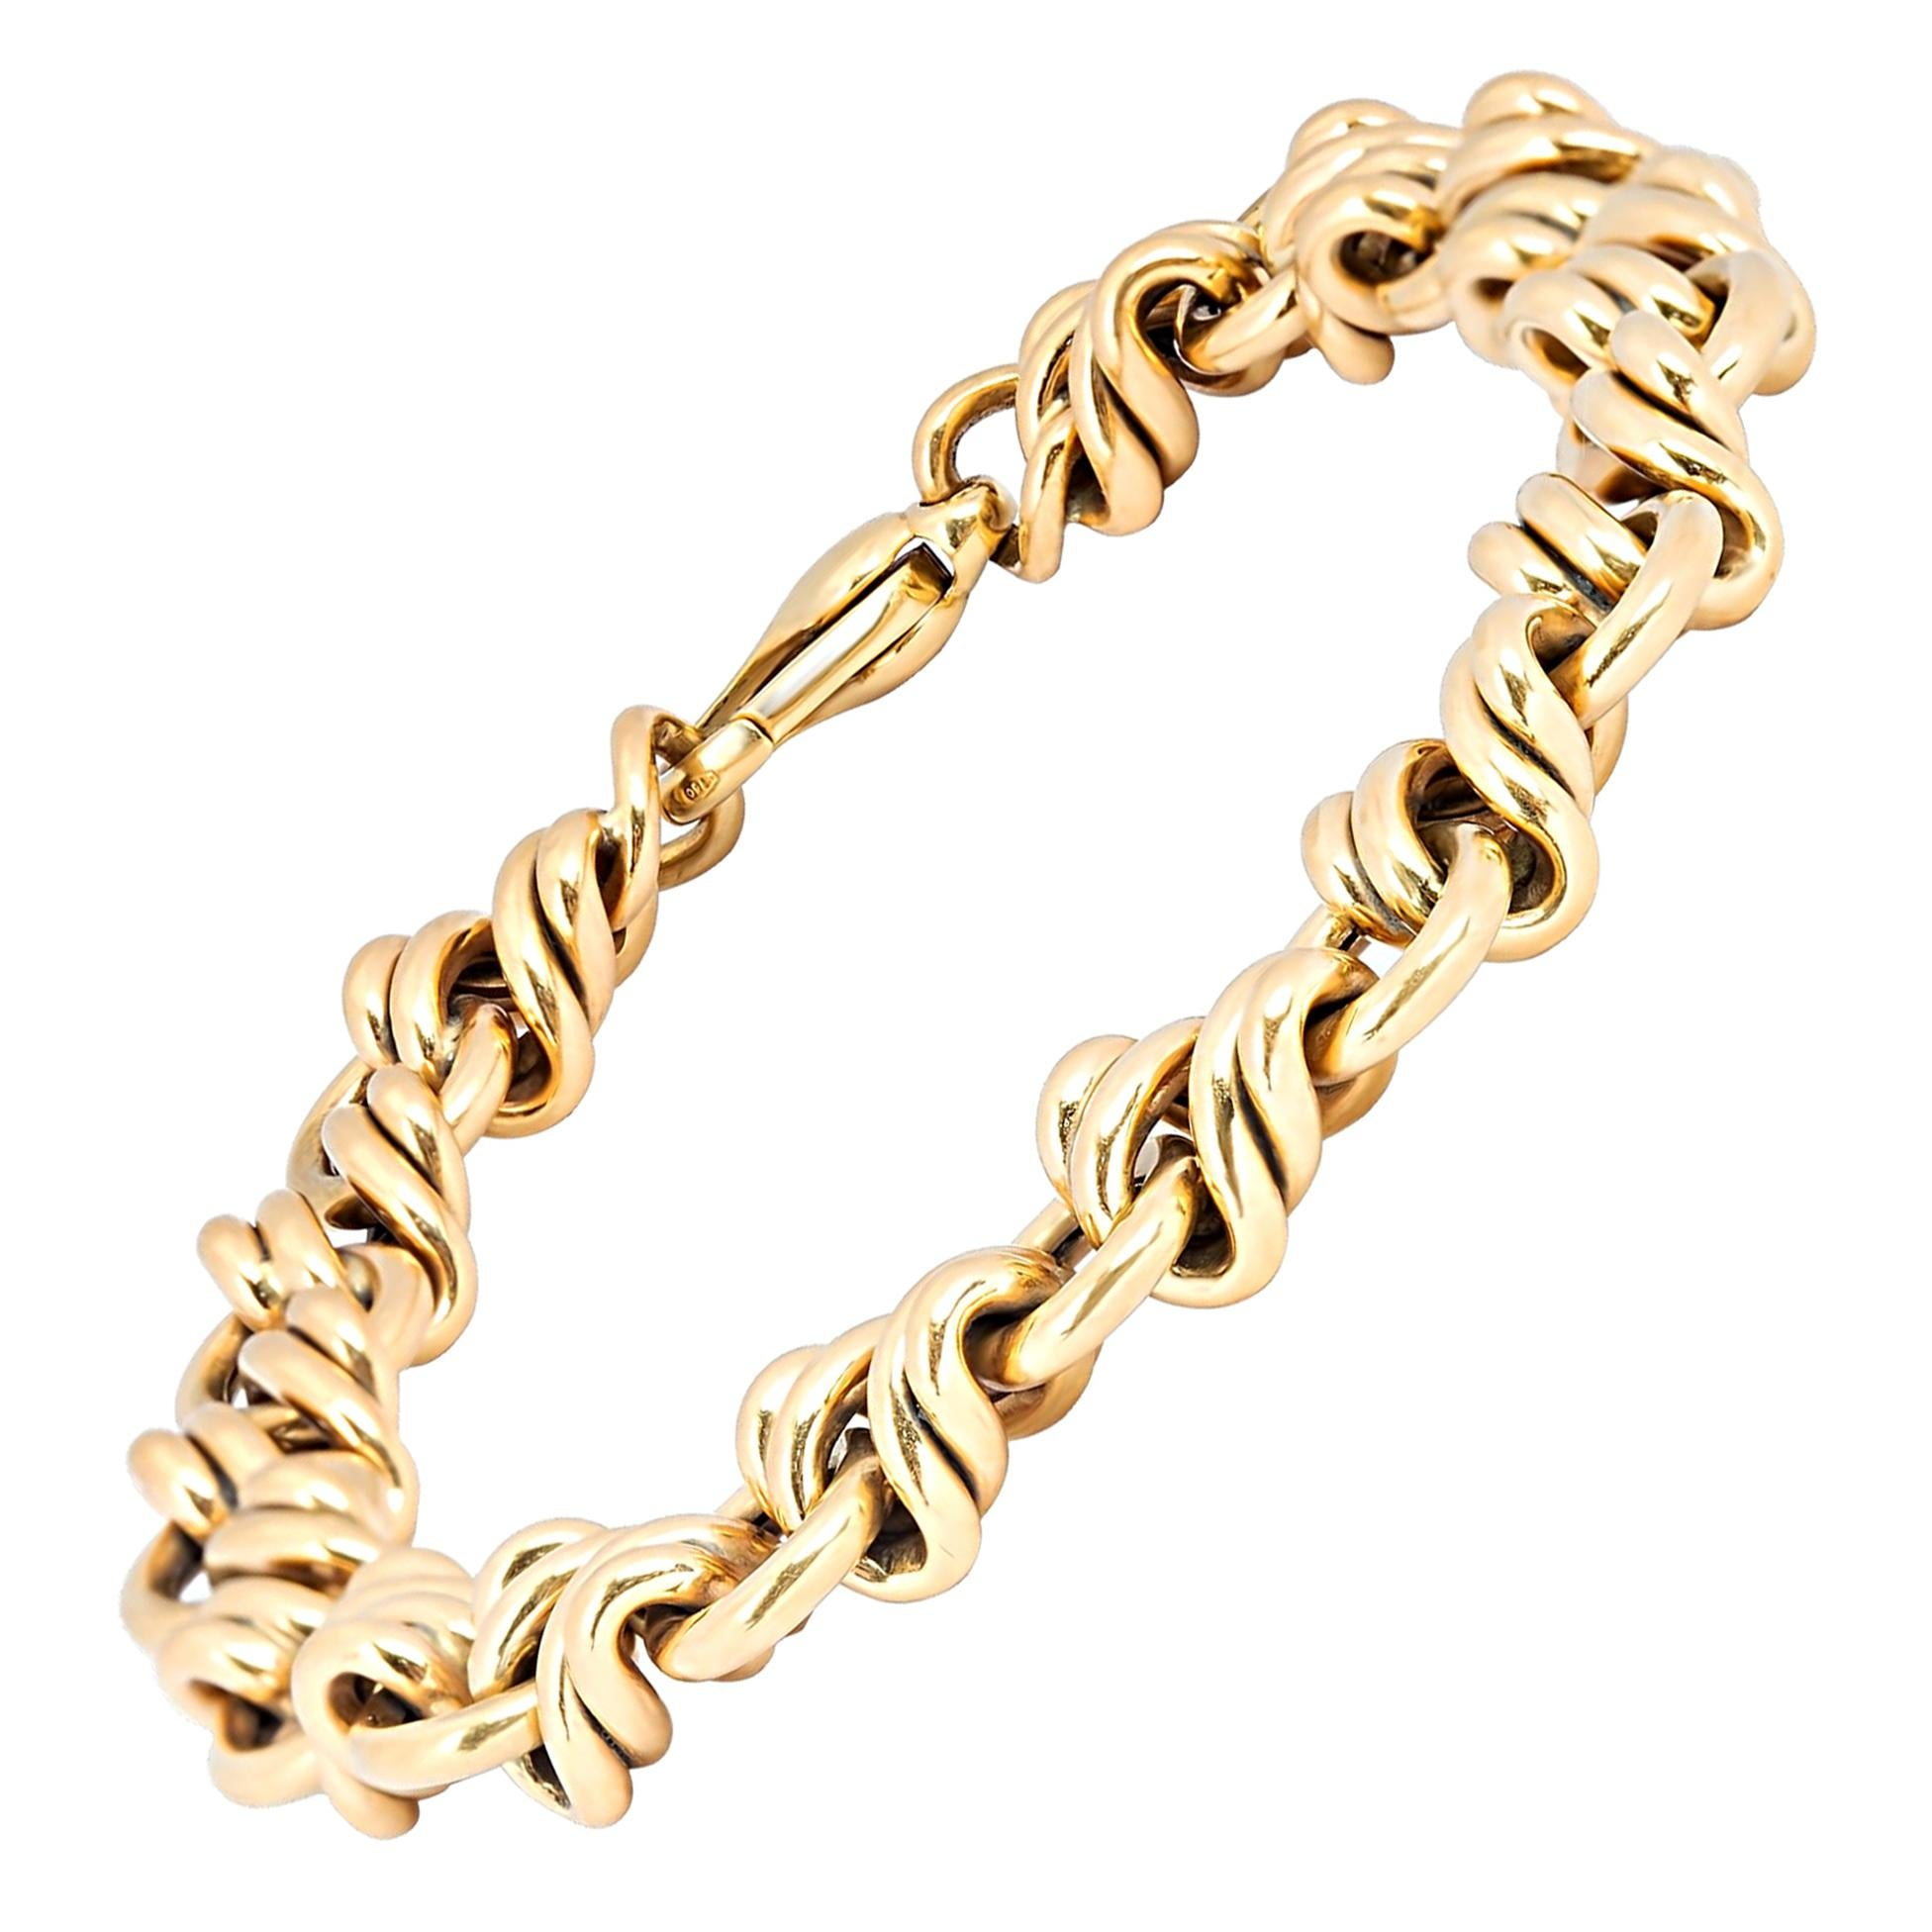 Tiffany & Co. Vintage 18 Karat Yellow Gold Knot Bracelet